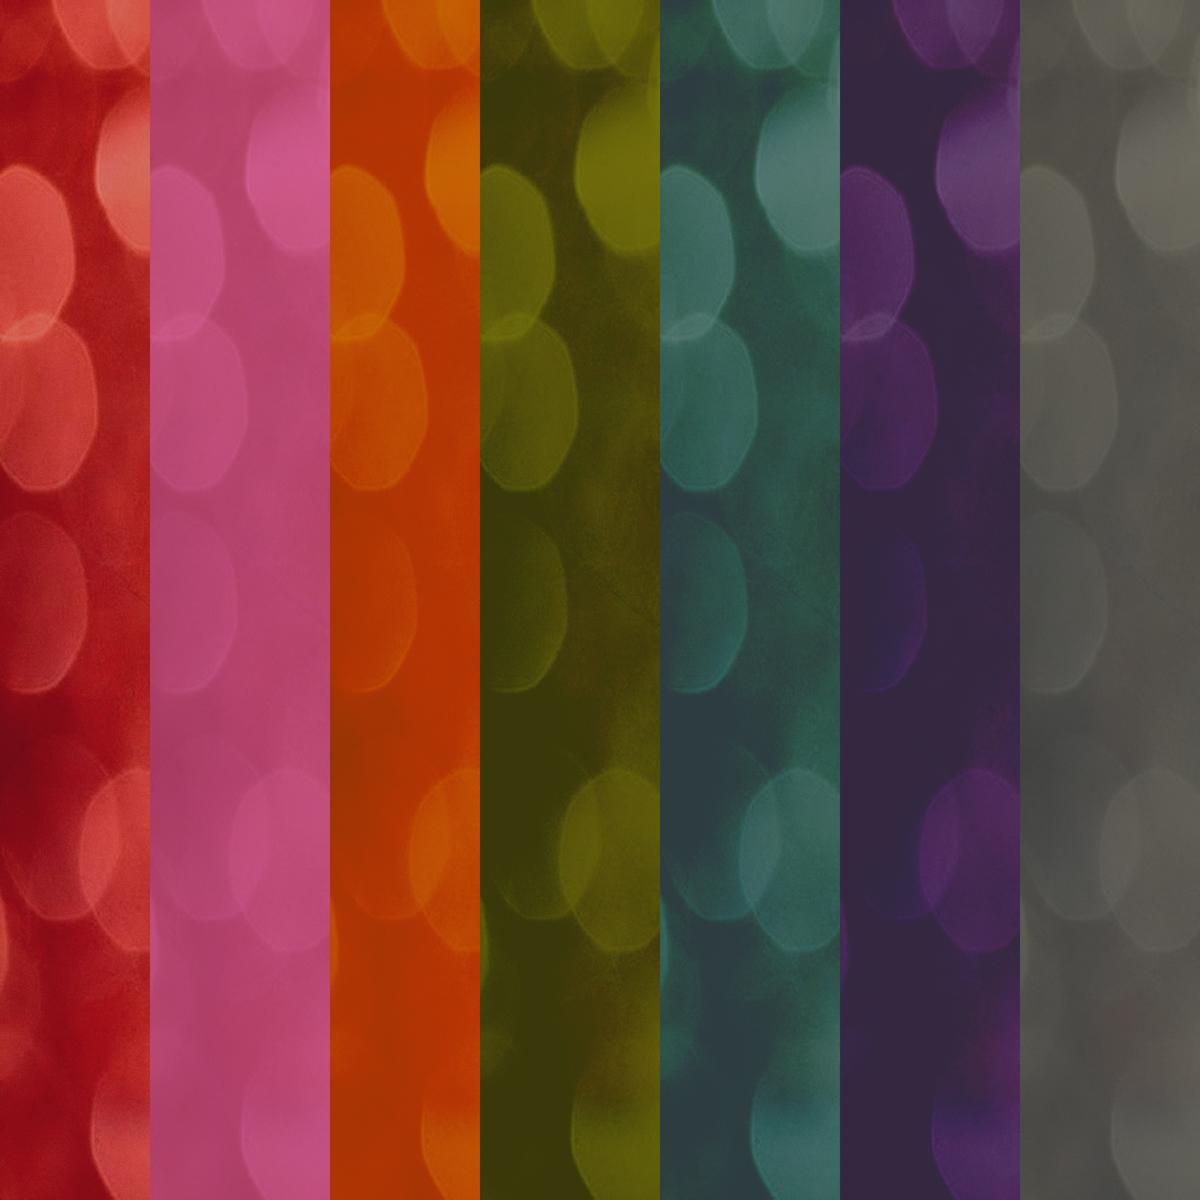 1000 images about colors jewel tones on pinterest. Black Bedroom Furniture Sets. Home Design Ideas